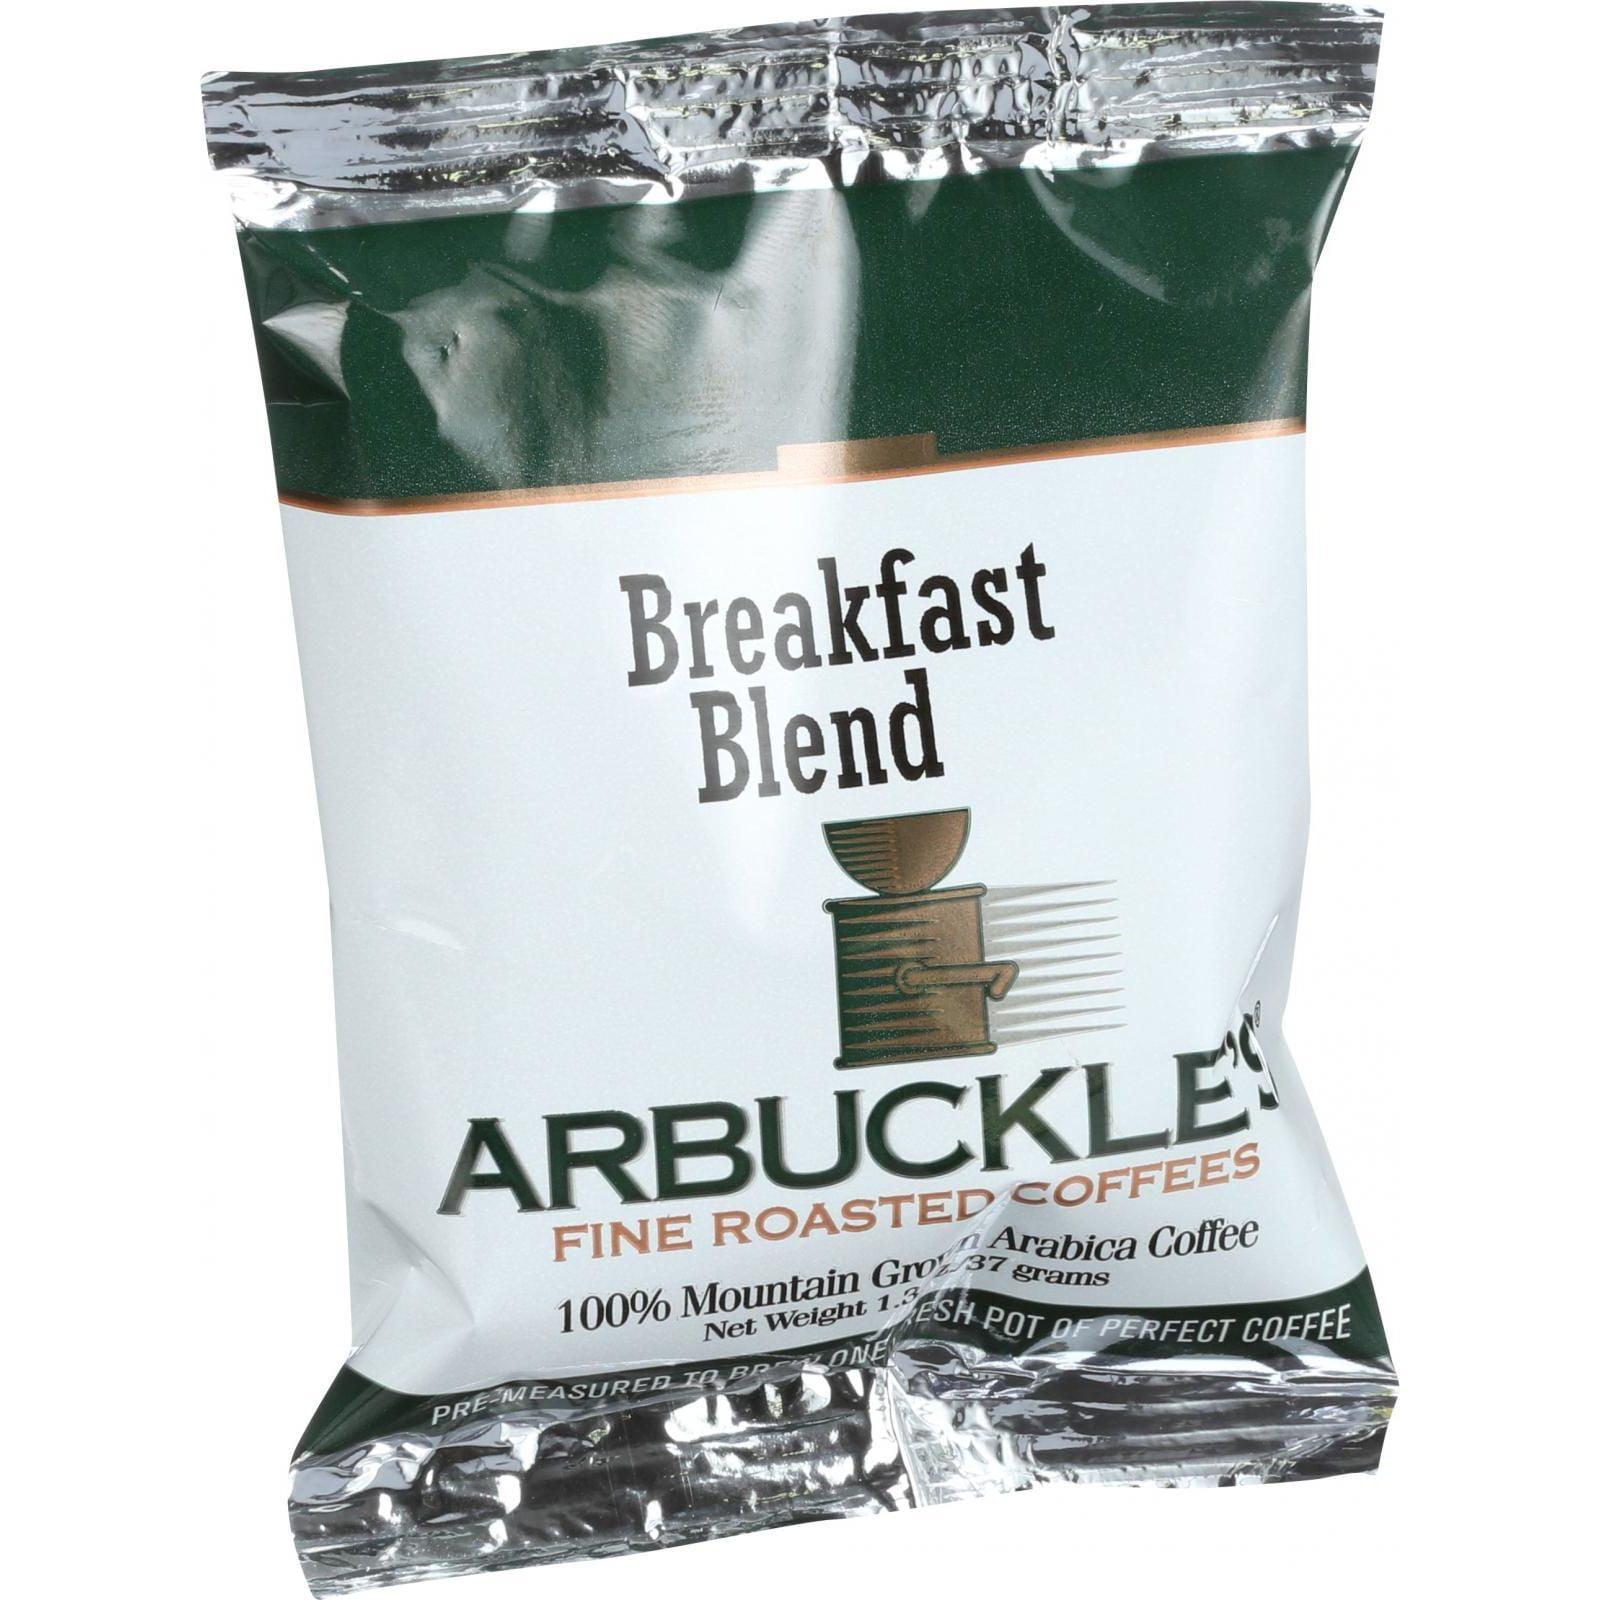 Arbuckles' Coffee - Breakfast Blend - 1.3 oz - Case of 10